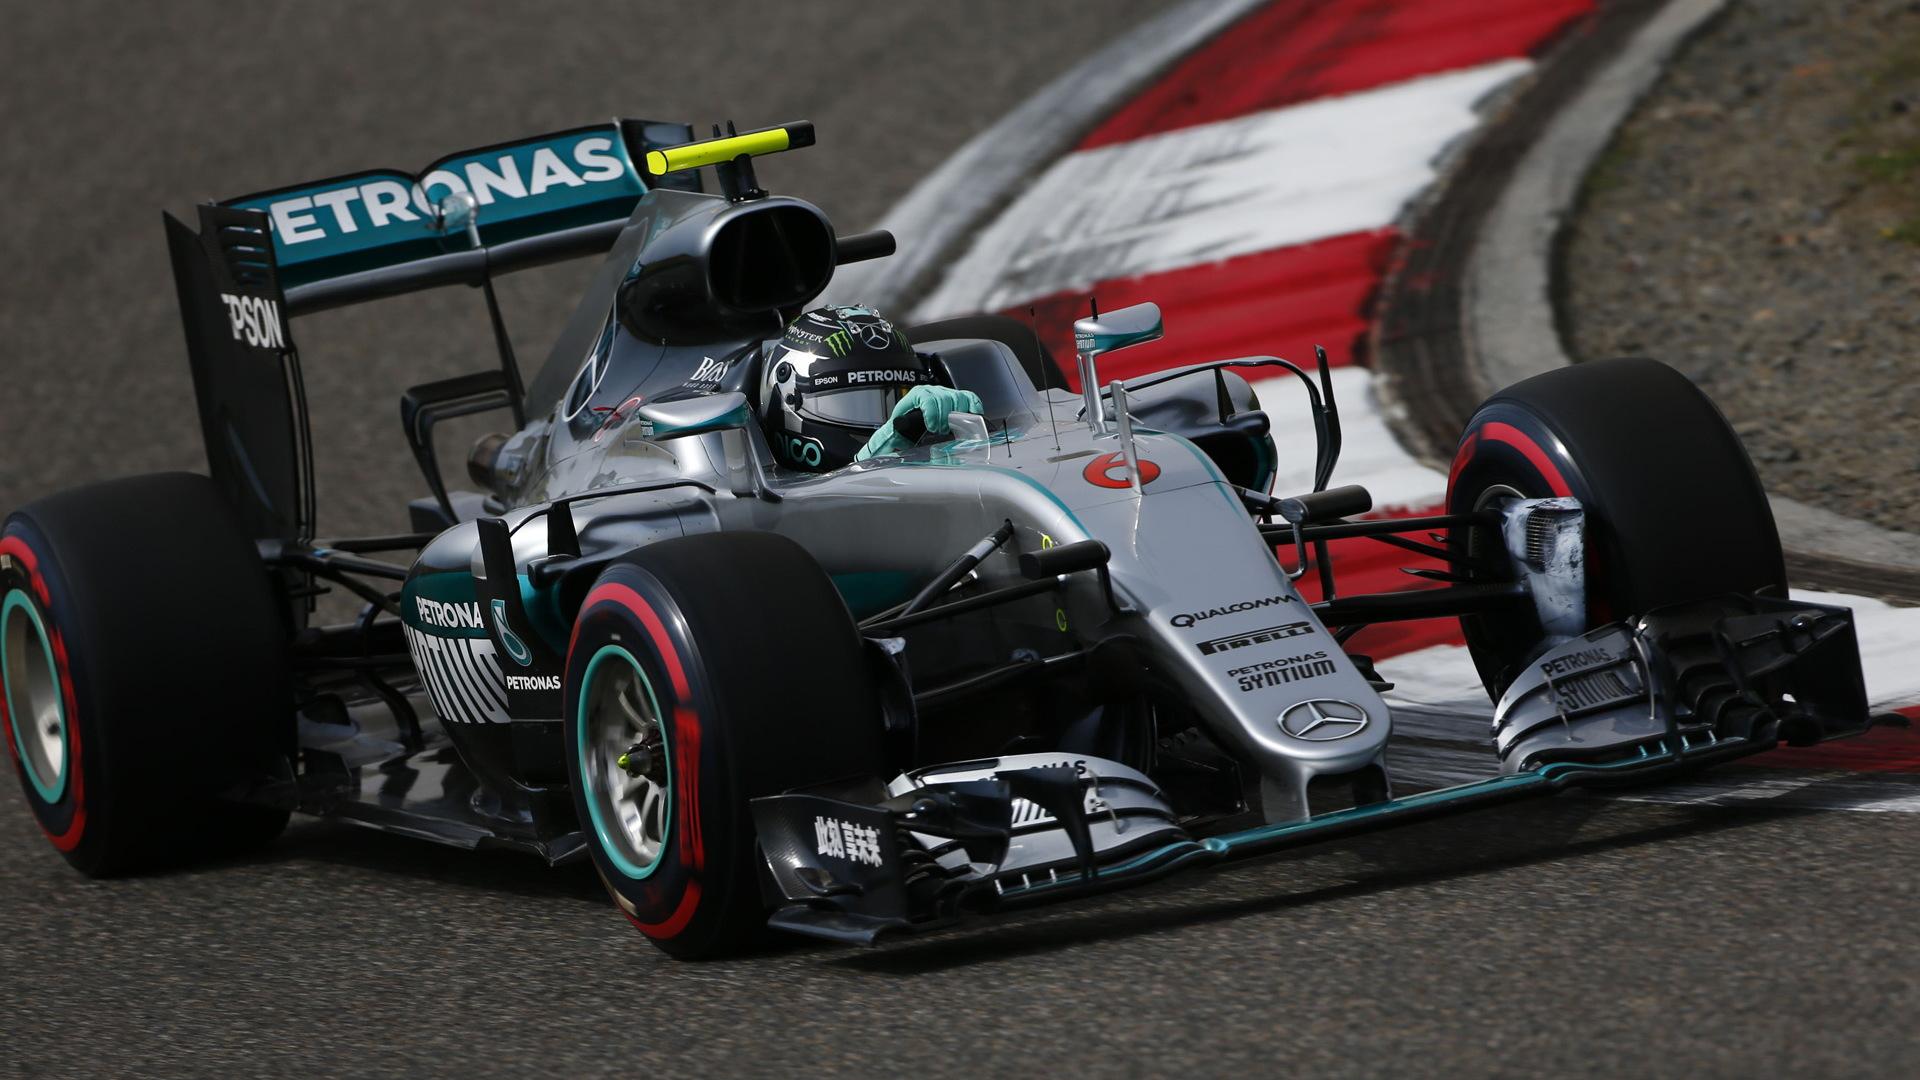 Mercedes AMG's Nico Rosberg at the 2016 Formula One Chinese Grand Prix